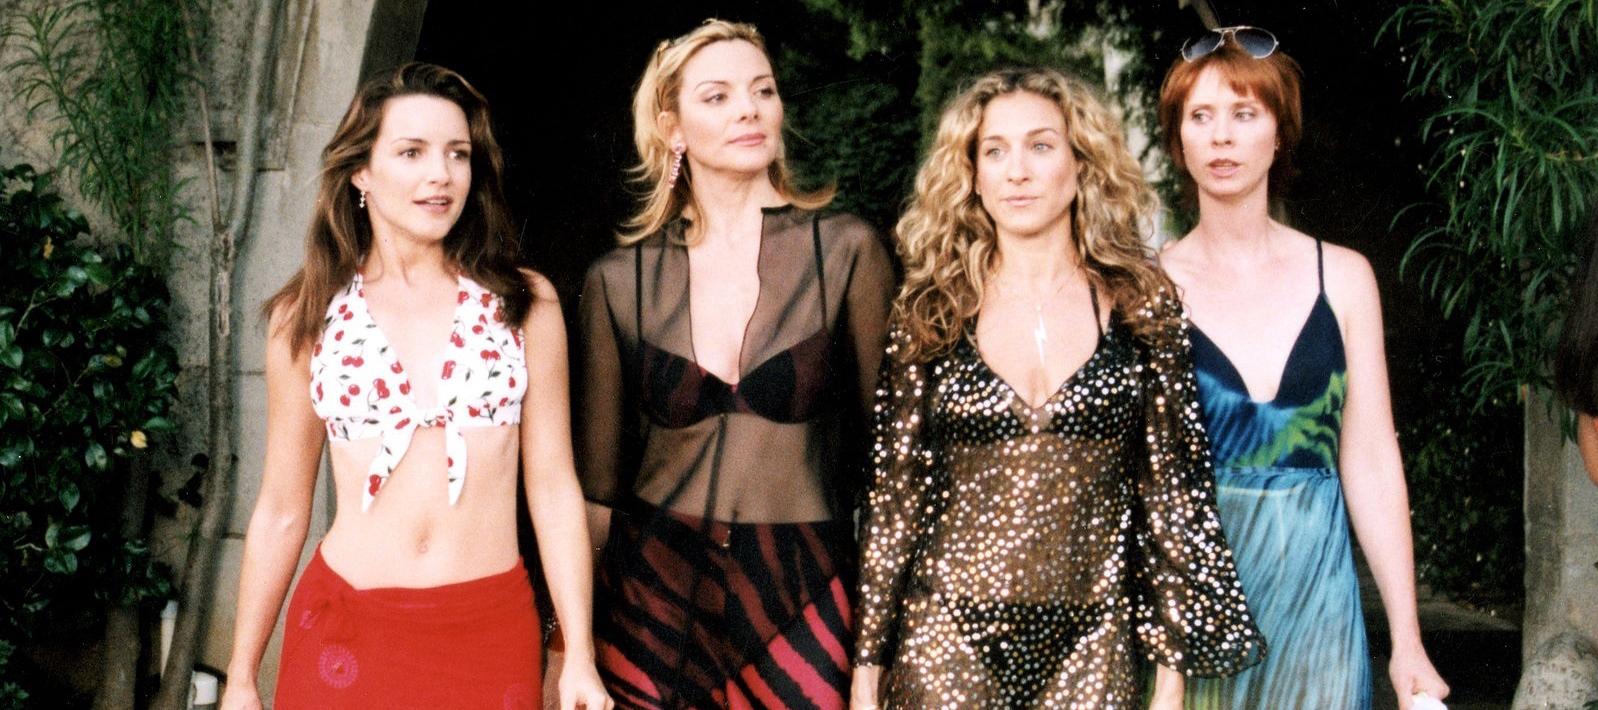 Les actrius protagonistes de 'Sexo en Nueva York' - Europa Press